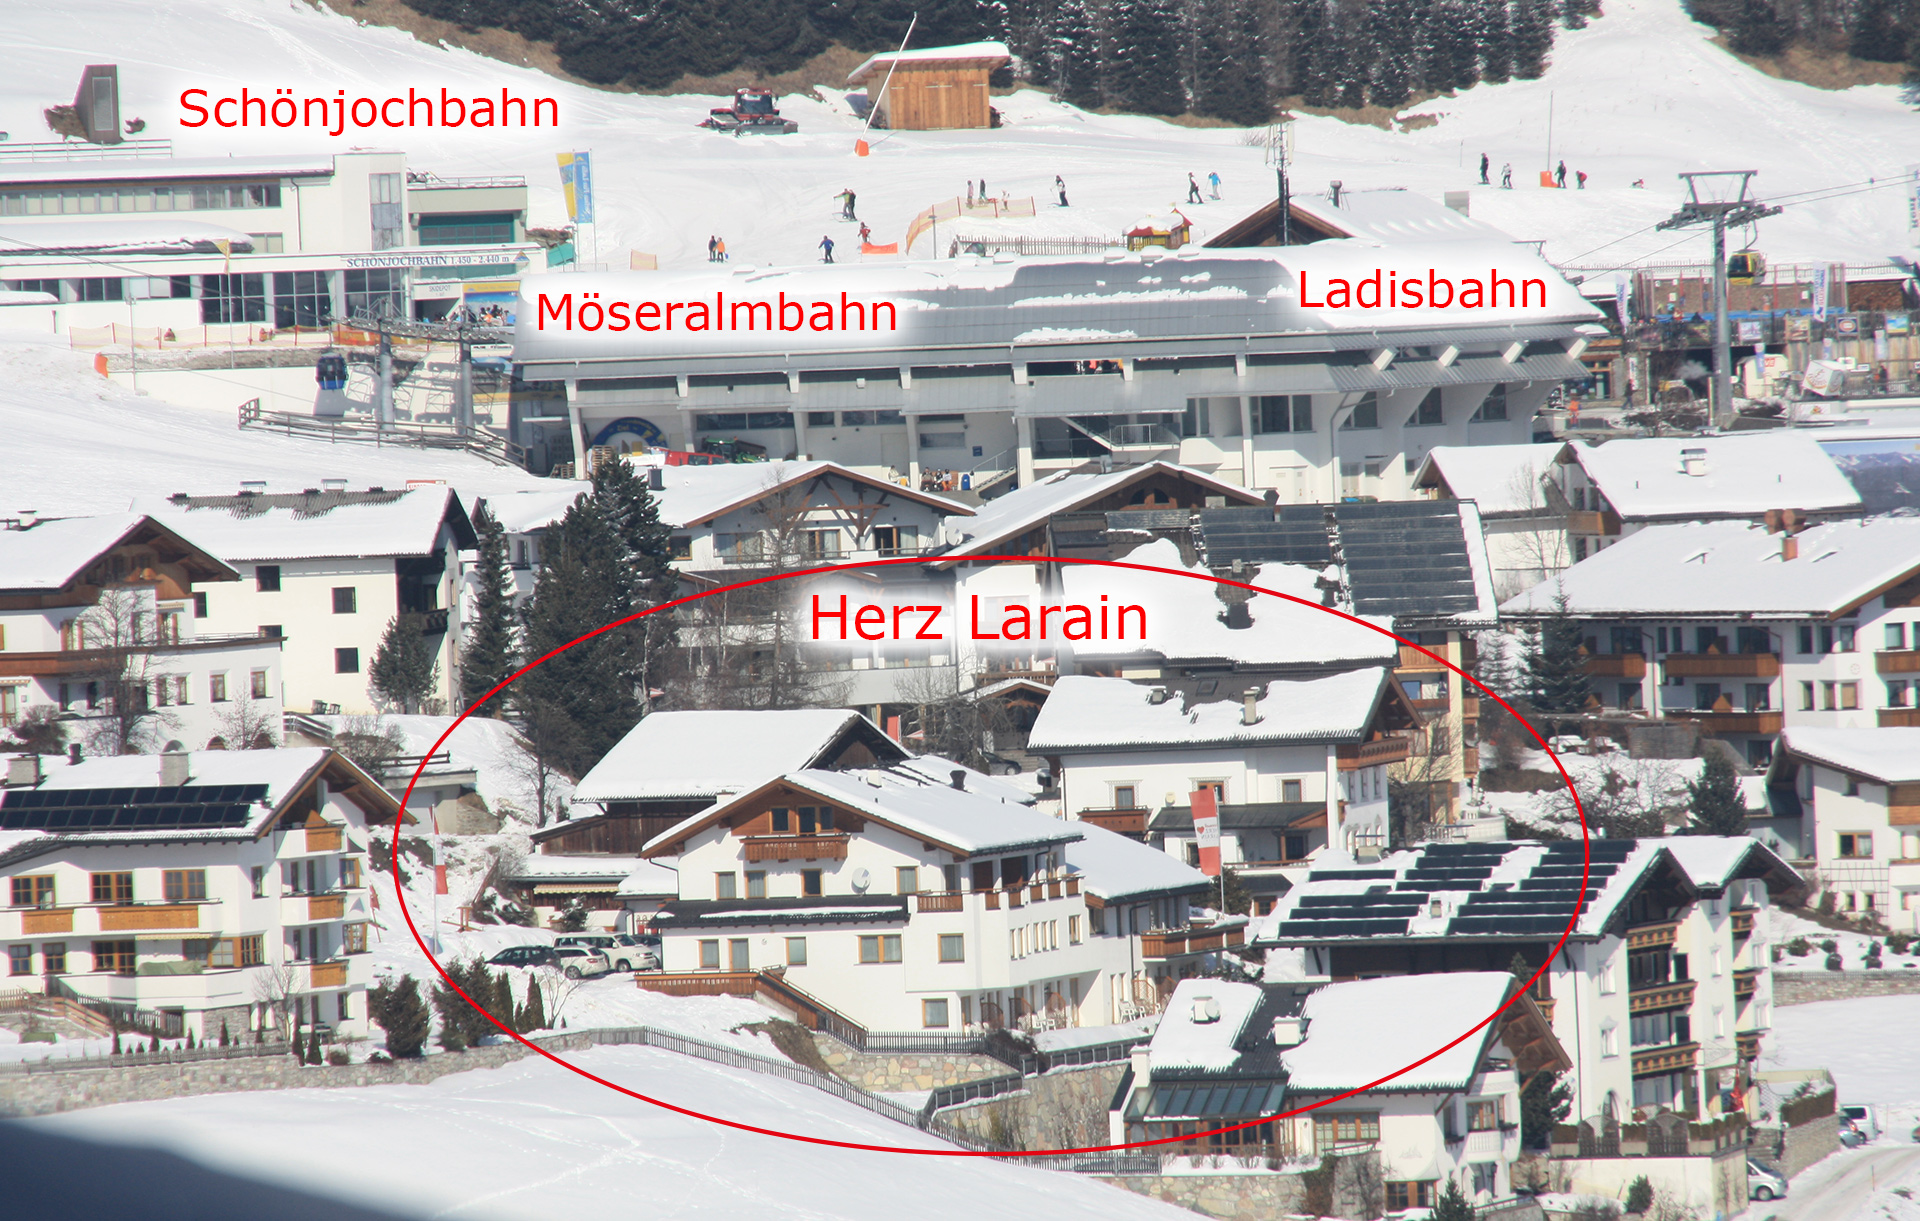 Lage | Herz Larain Fiss | Hotel Fiss | Serfaus Fiss Ladis ...